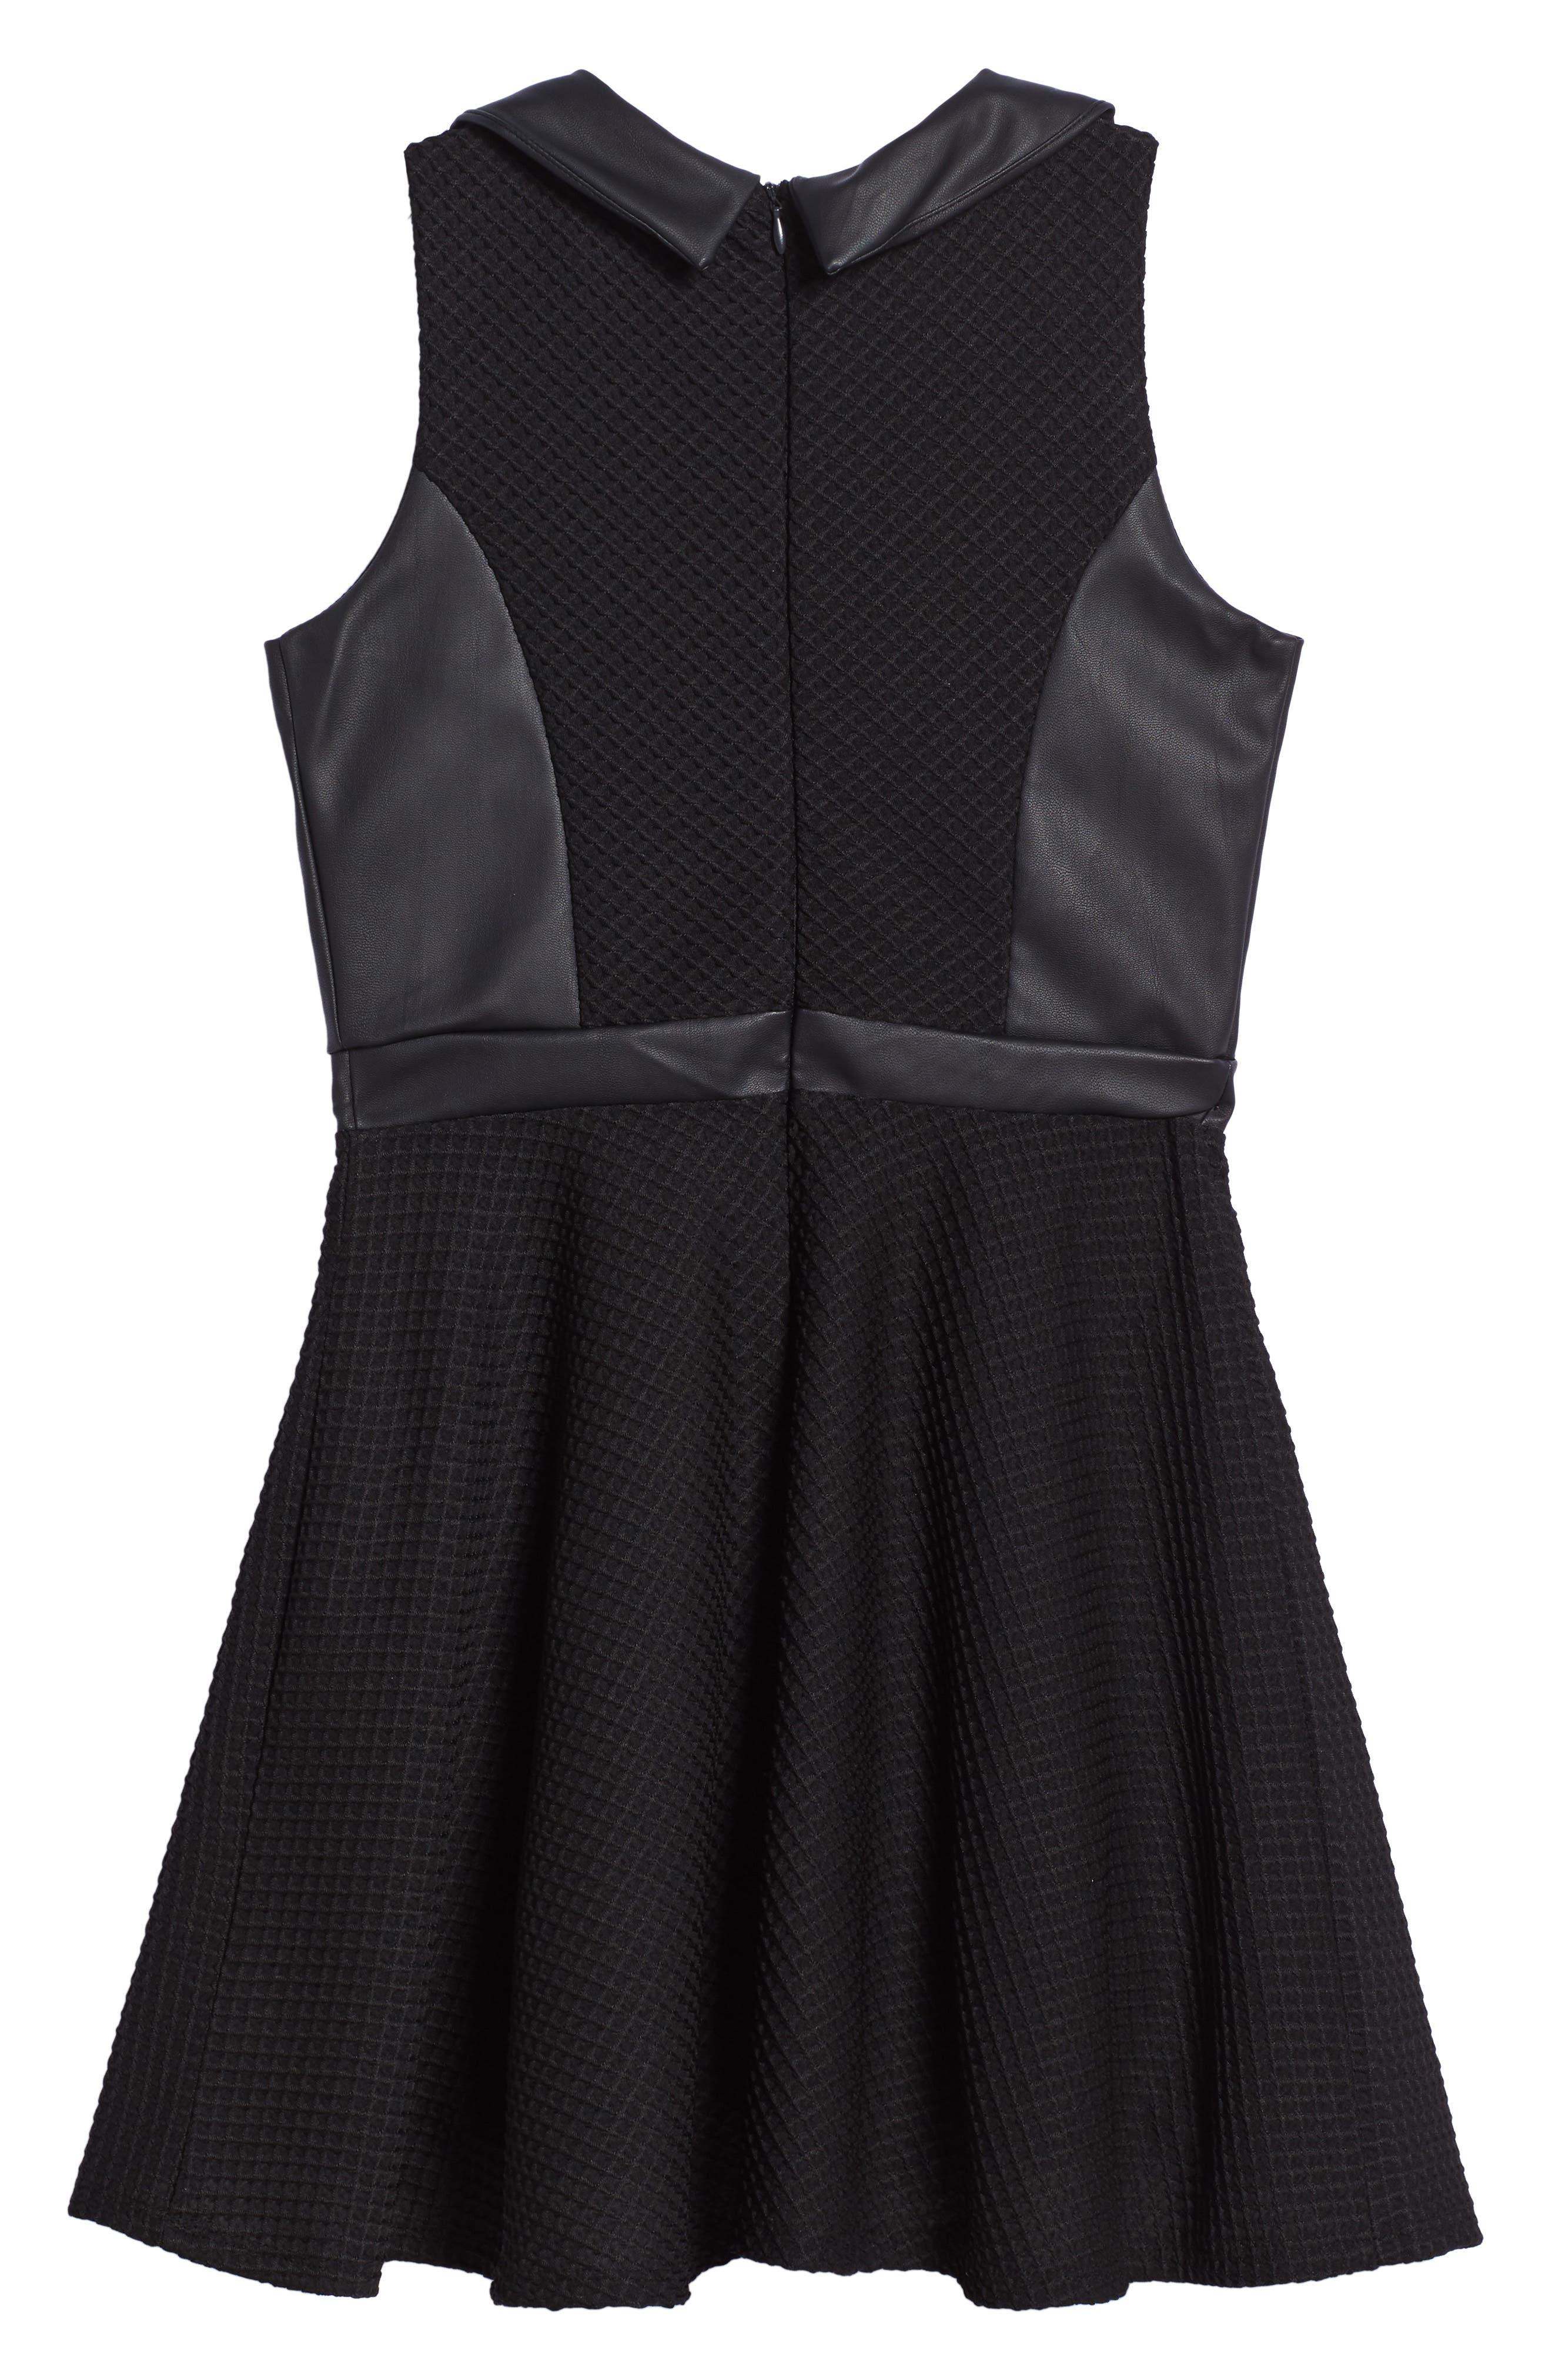 Alternate Image 2  - Maddie Faux Leather Skater Dress (Big Girls)